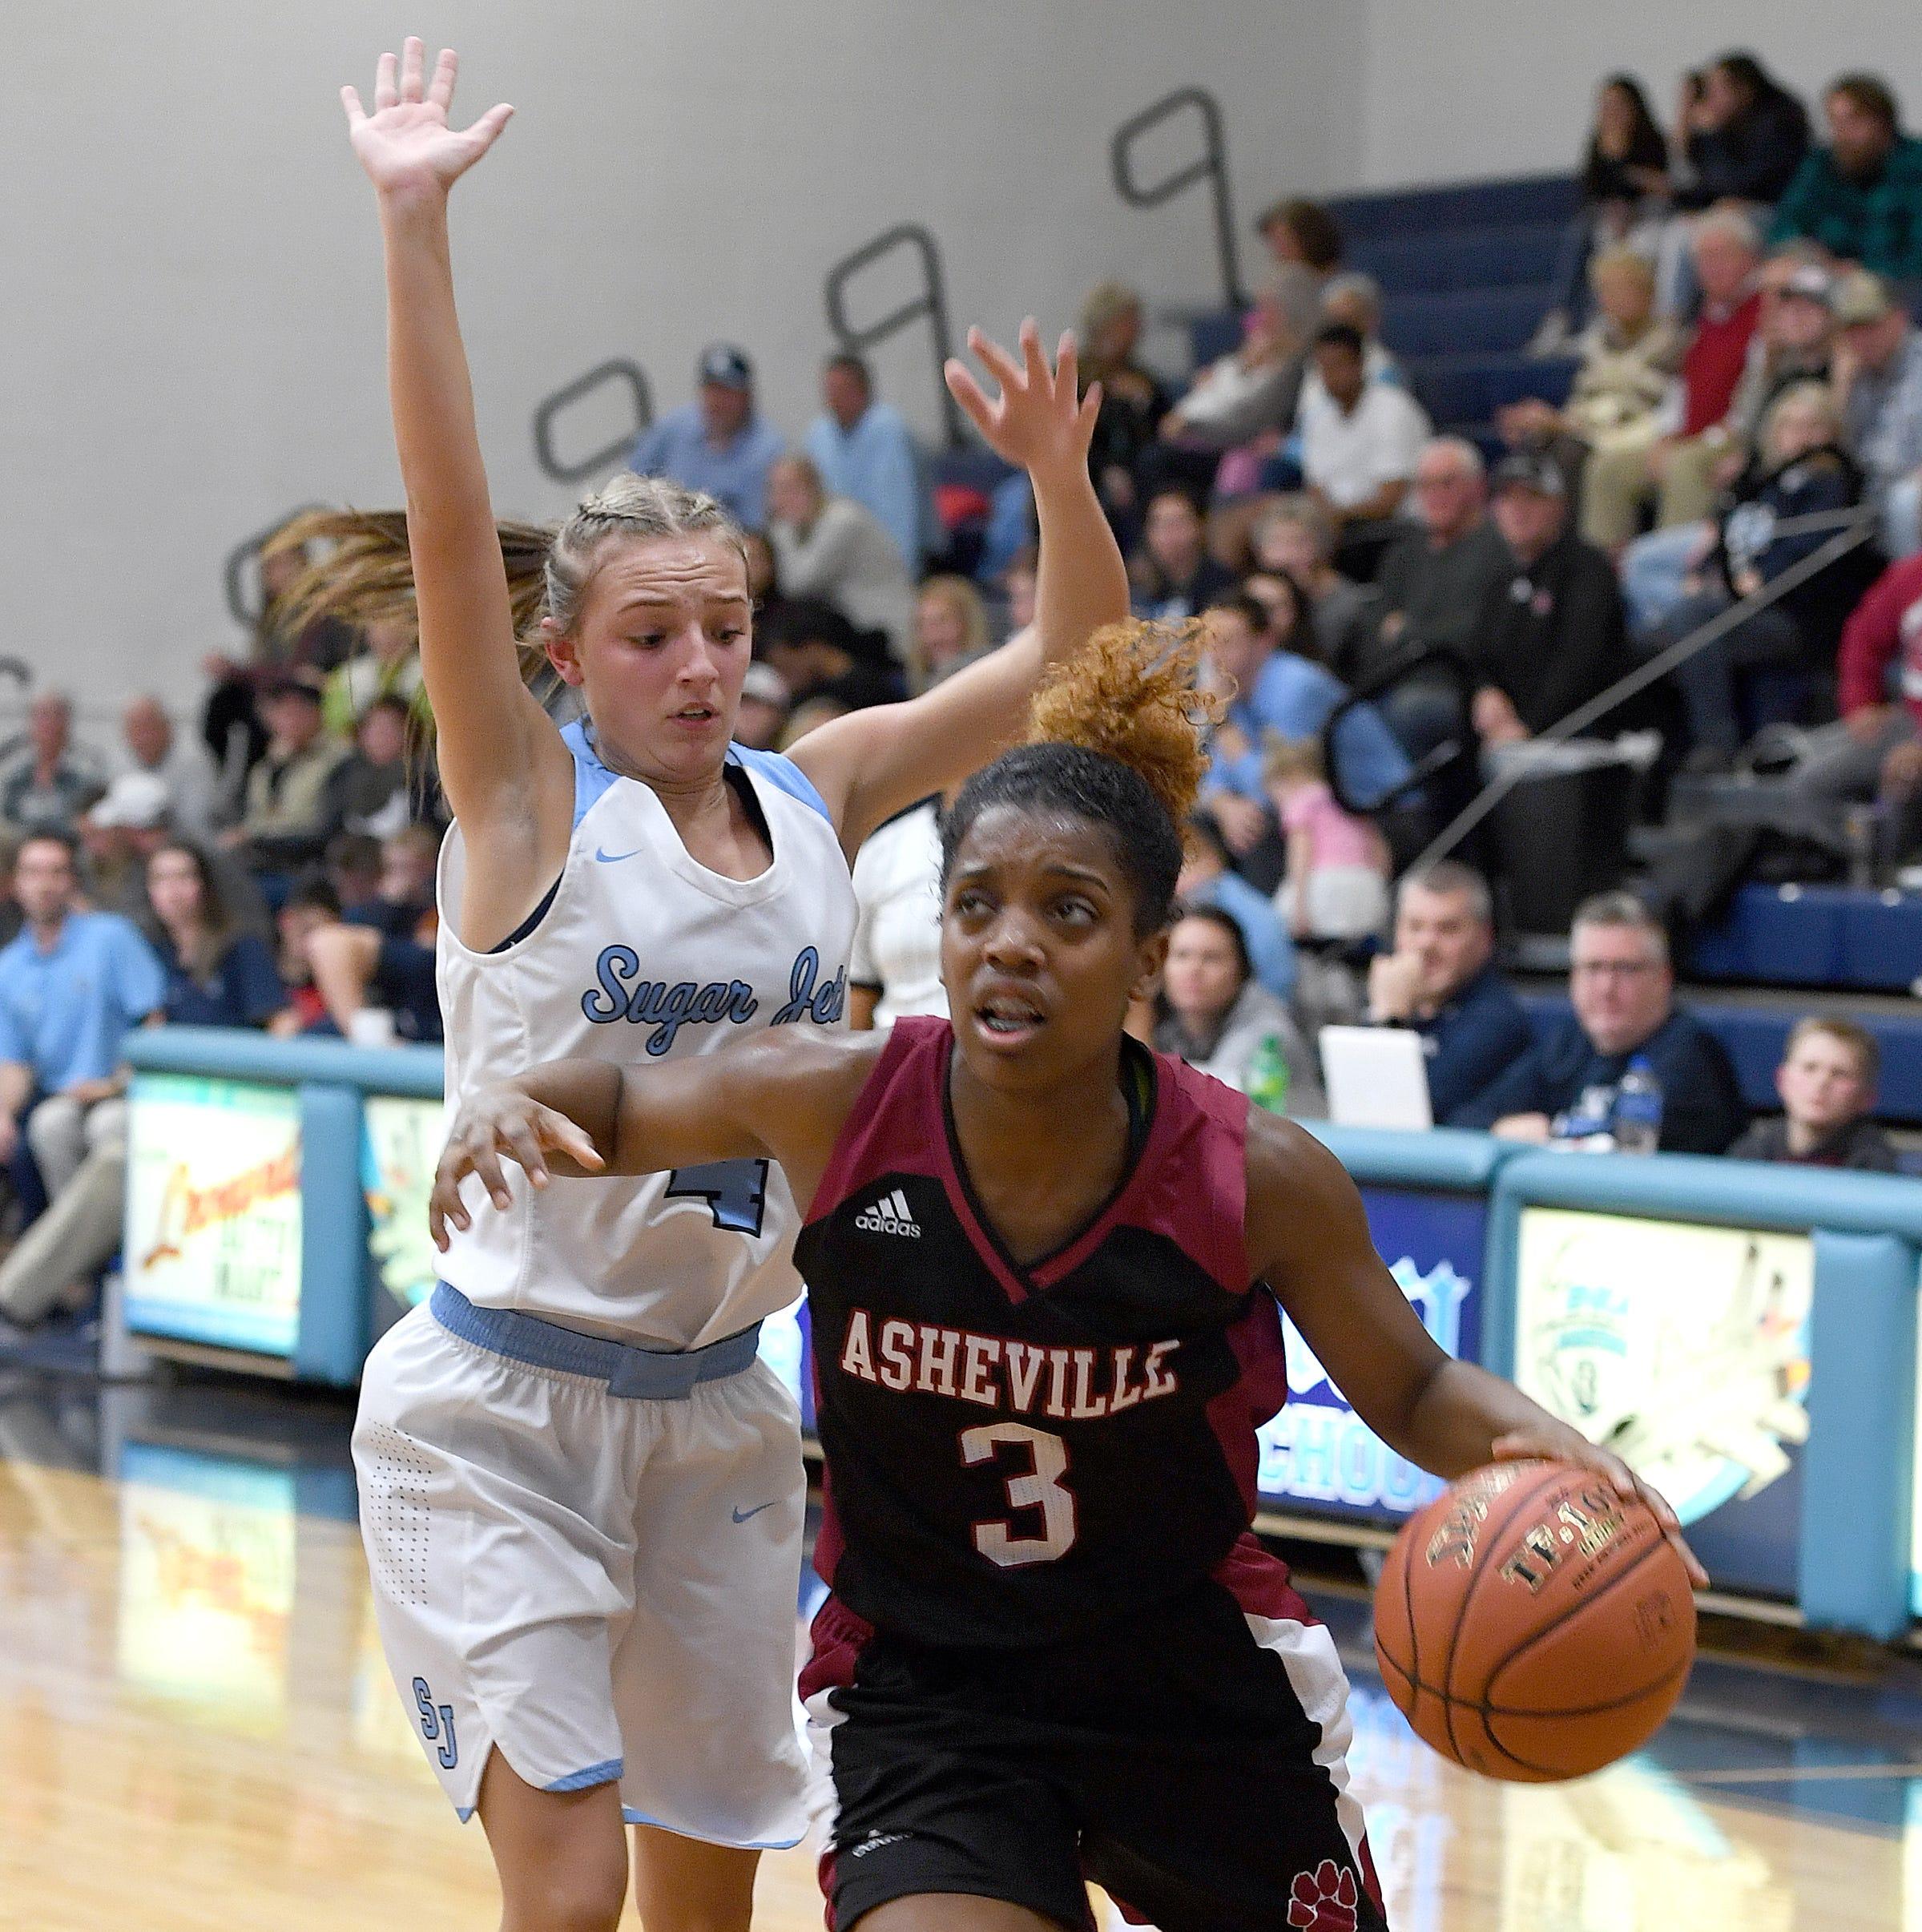 Asheville High's Amber Redmond picks up Division I offer